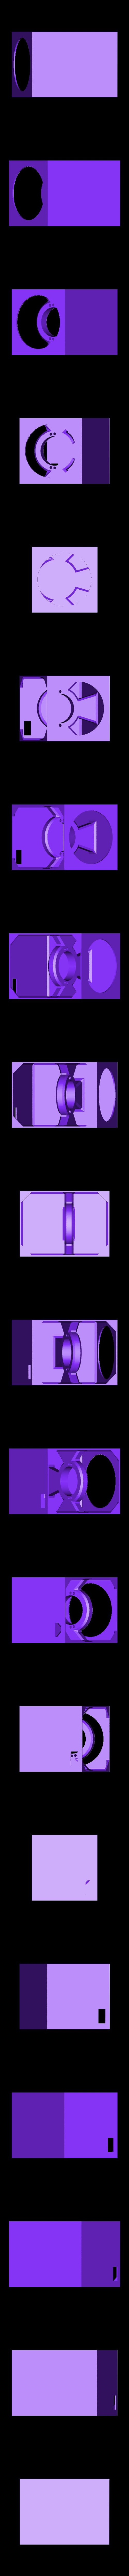 Watch_Winder_Case.stl Télécharger fichier STL gratuit WatchWinder | Uhrenbeweger • Objet à imprimer en 3D, Sparhawk